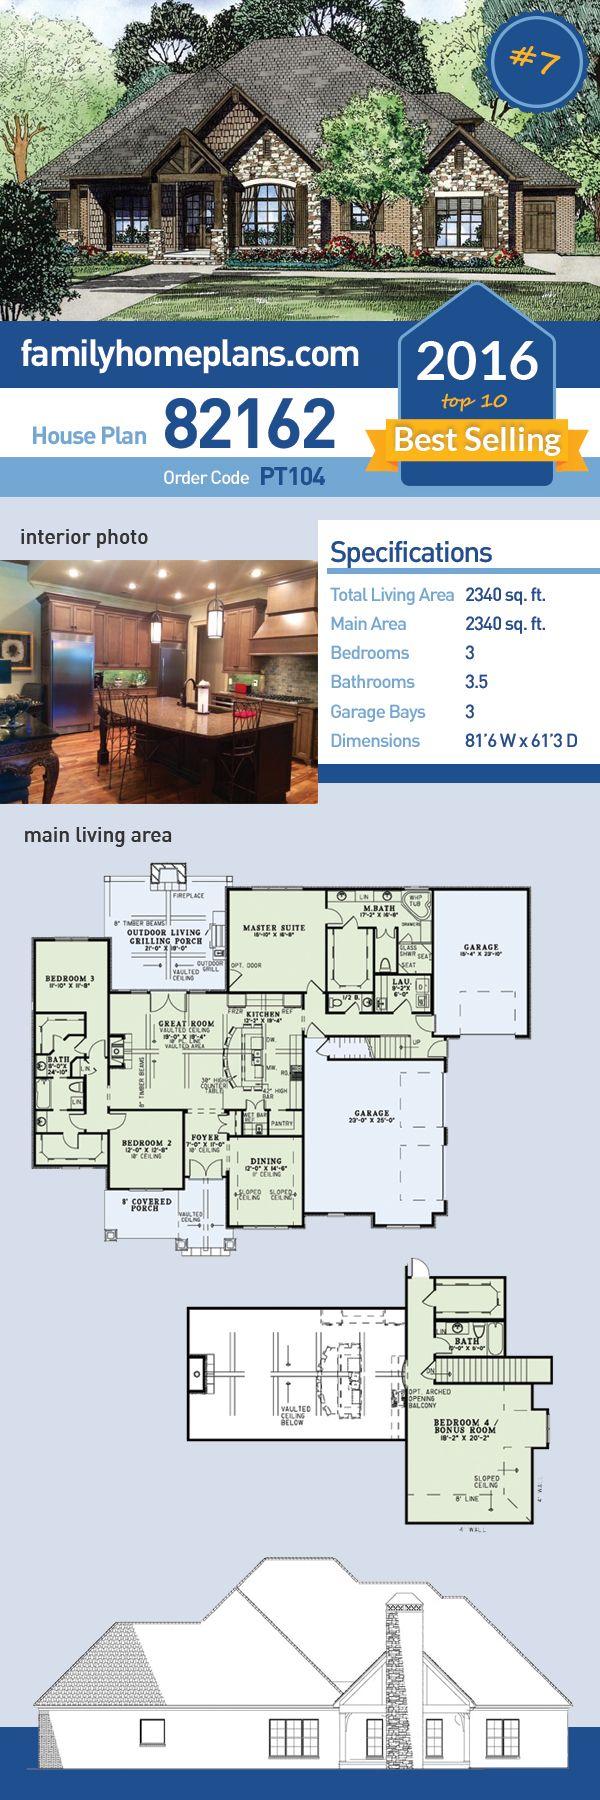 Craftsman european house plan 82162 craftsman house for Best selling floor plans